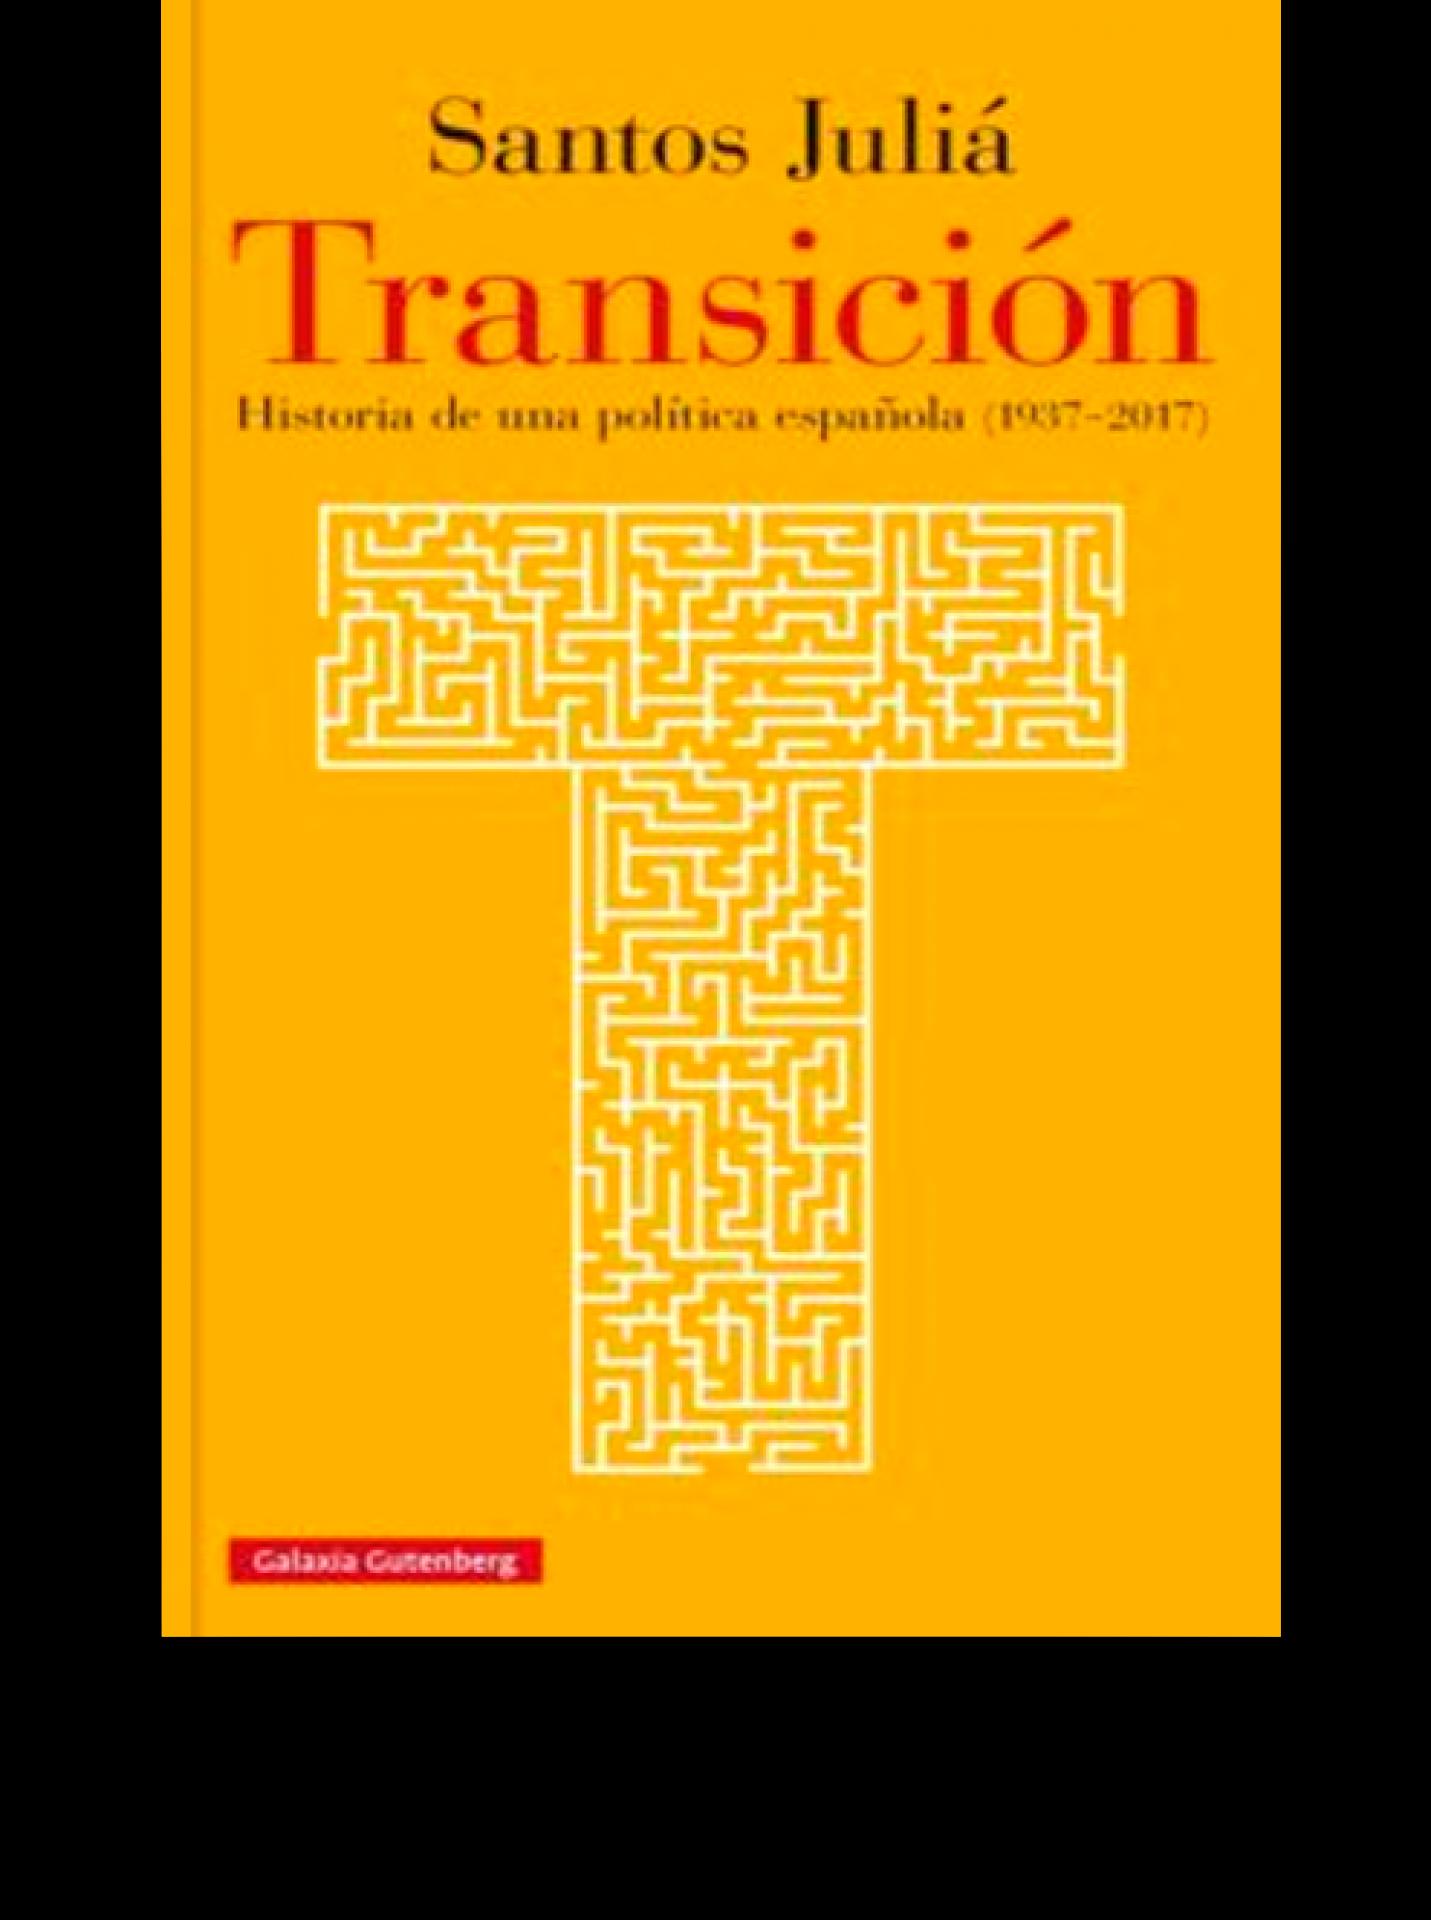 Transición